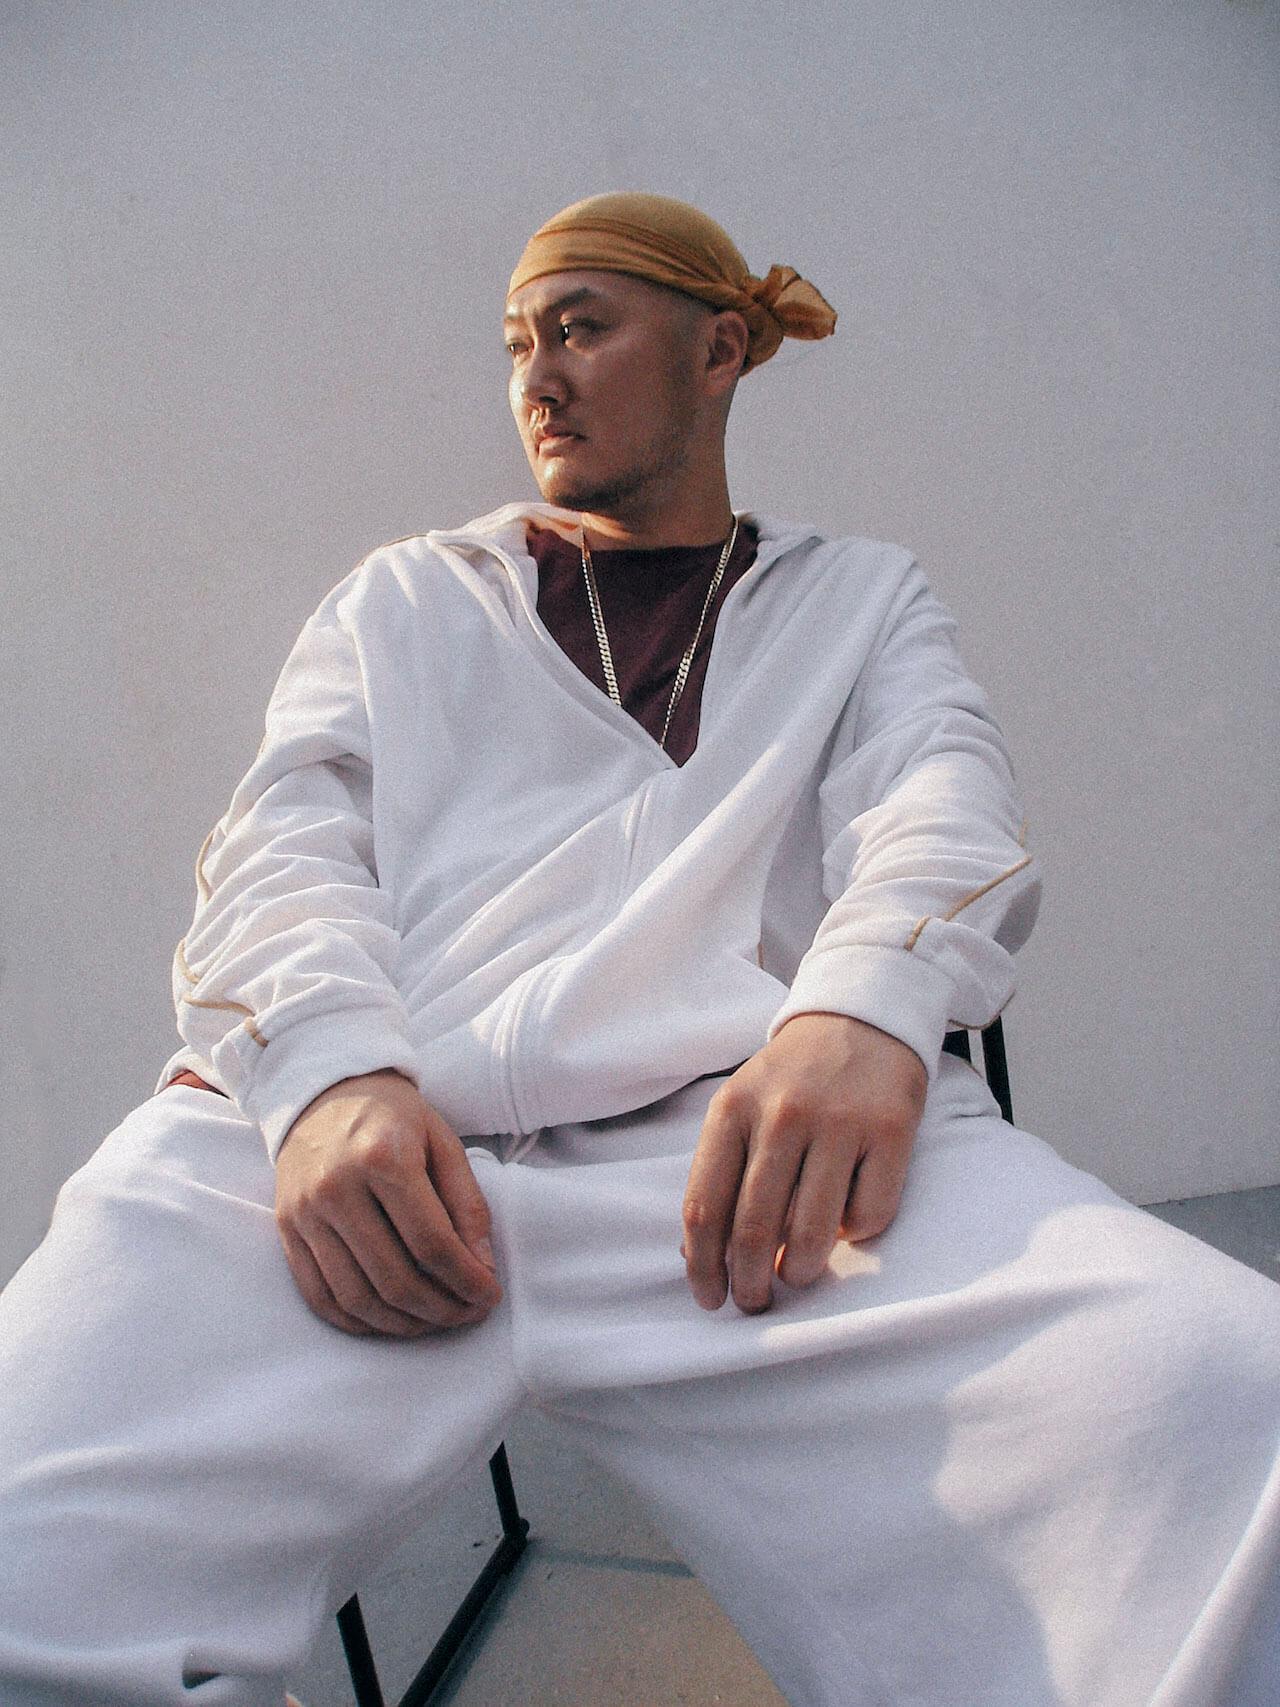 GAPPER、ついにソロ・デビューアルバムが完成 プロデュースは5lack、客演にDaichi Yamamotoら music210714-gapper-2